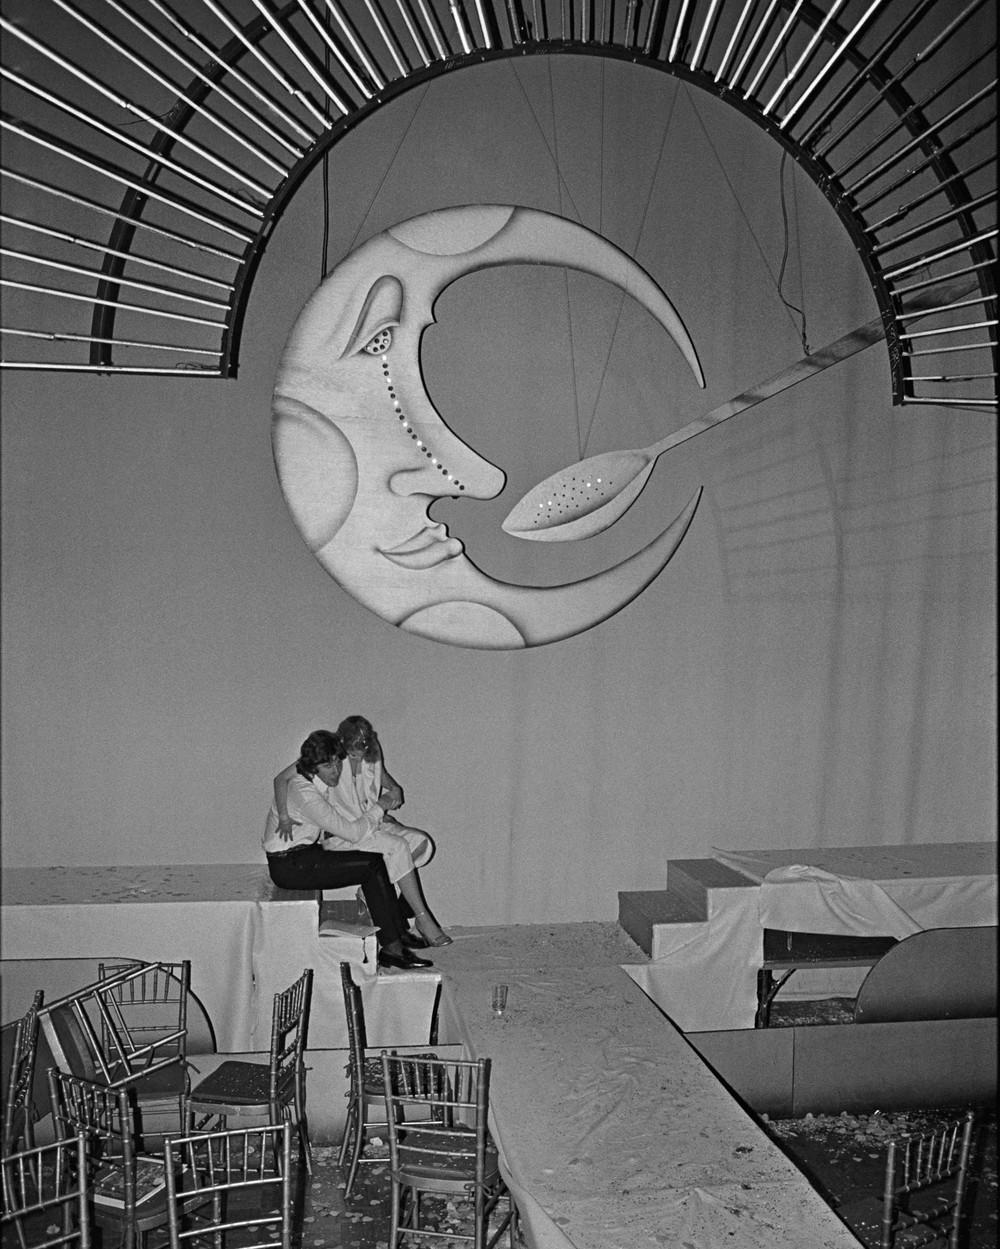 bill-bernstein-caught-the-last-days-of-disco-on-camera-204-body-image-1447679542-size_1000